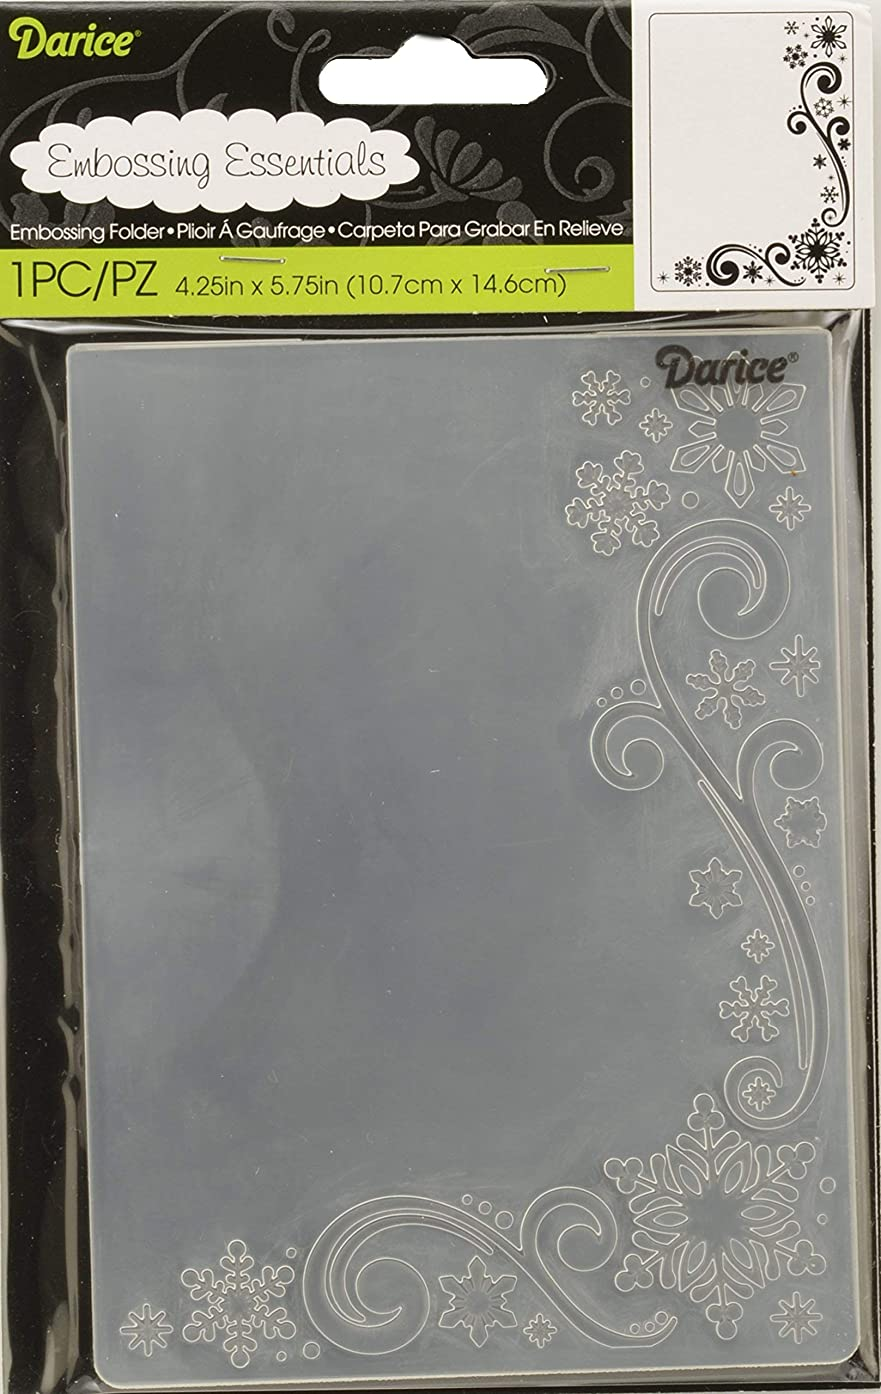 Darice 1218-117 Embossing Folder, 4.25 by 5.75-Inch, Snowflake Scroll Design